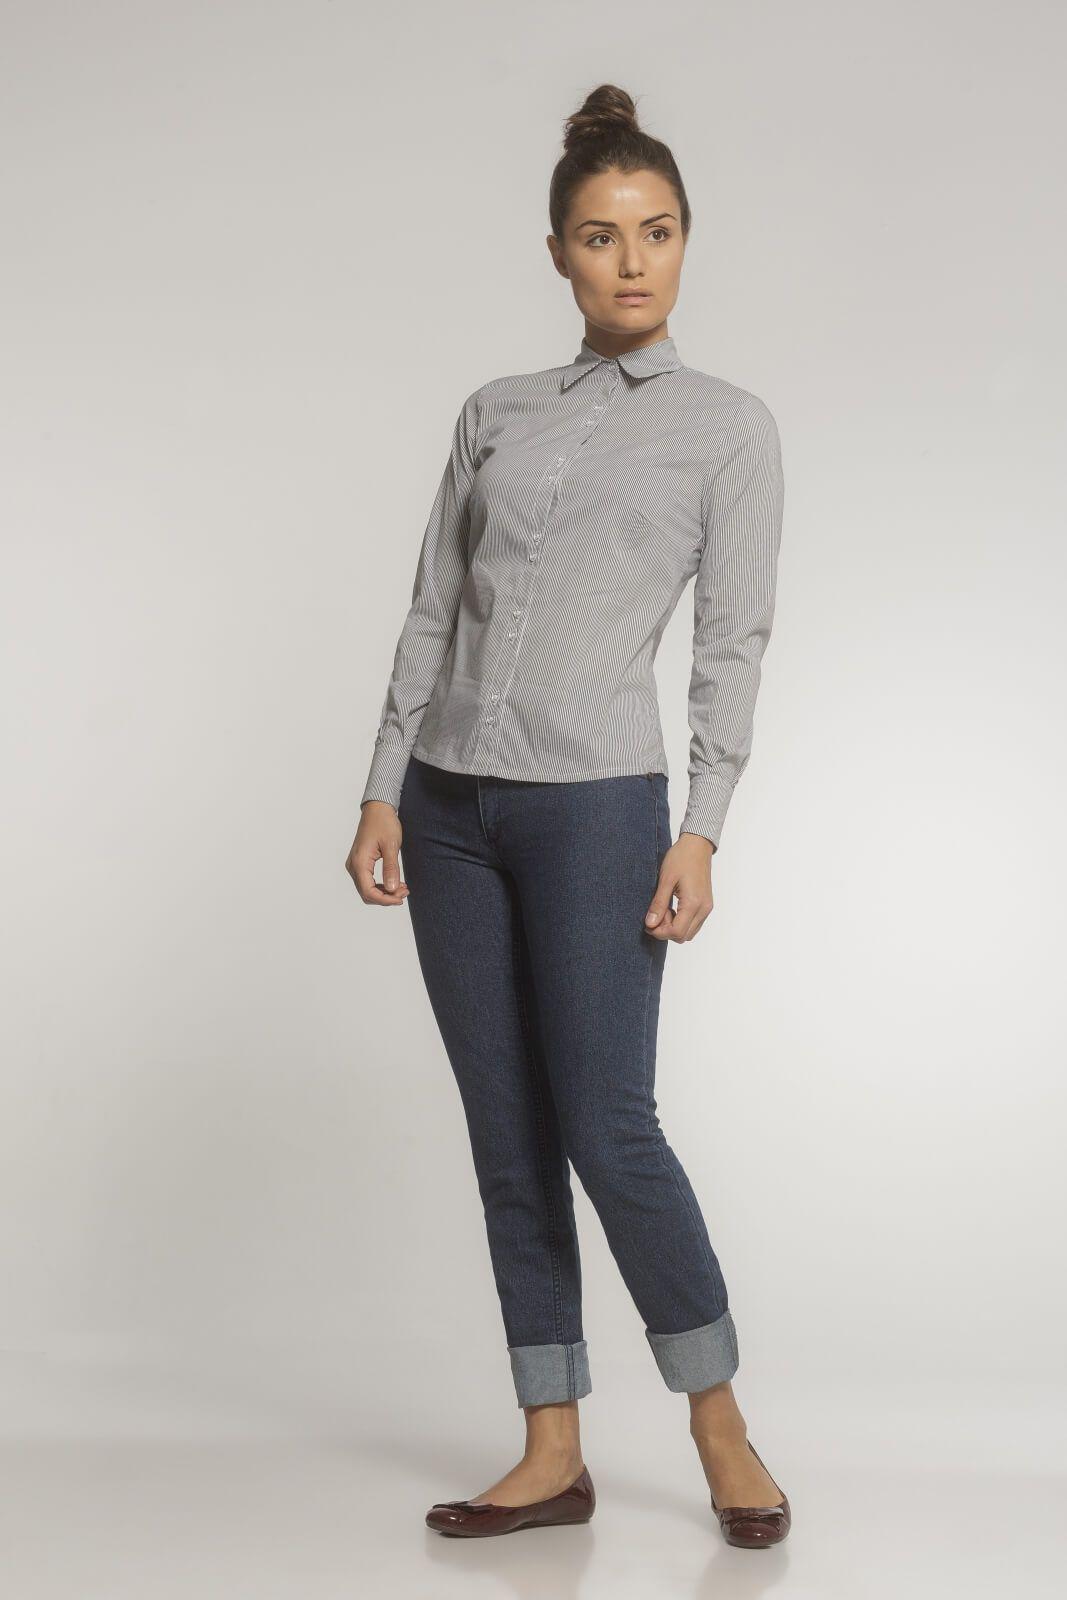 Camisa Social Tricoline Listrado Preto e Branco